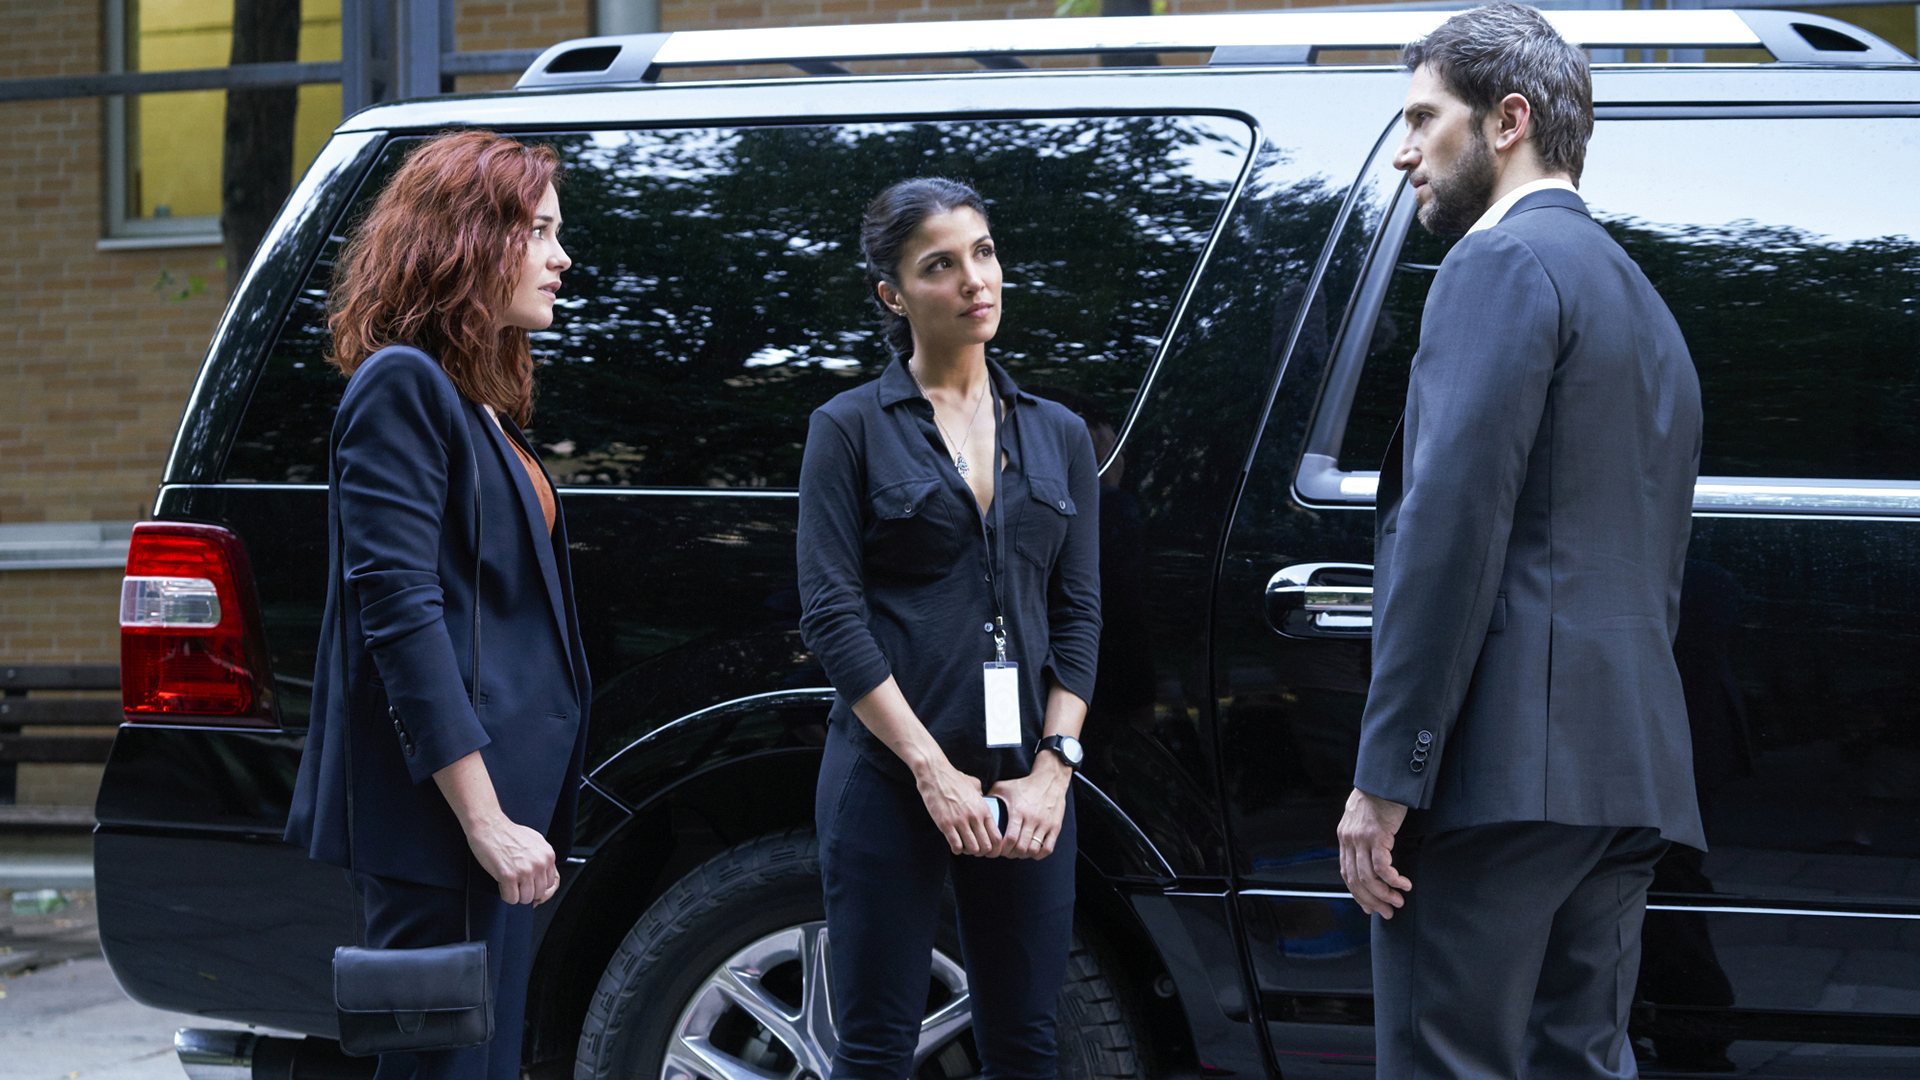 Sarah Greene as Maxine Carlson, Nazneen Contractor as Zara Hallam, and Luke Roberts as Eric Beaumont